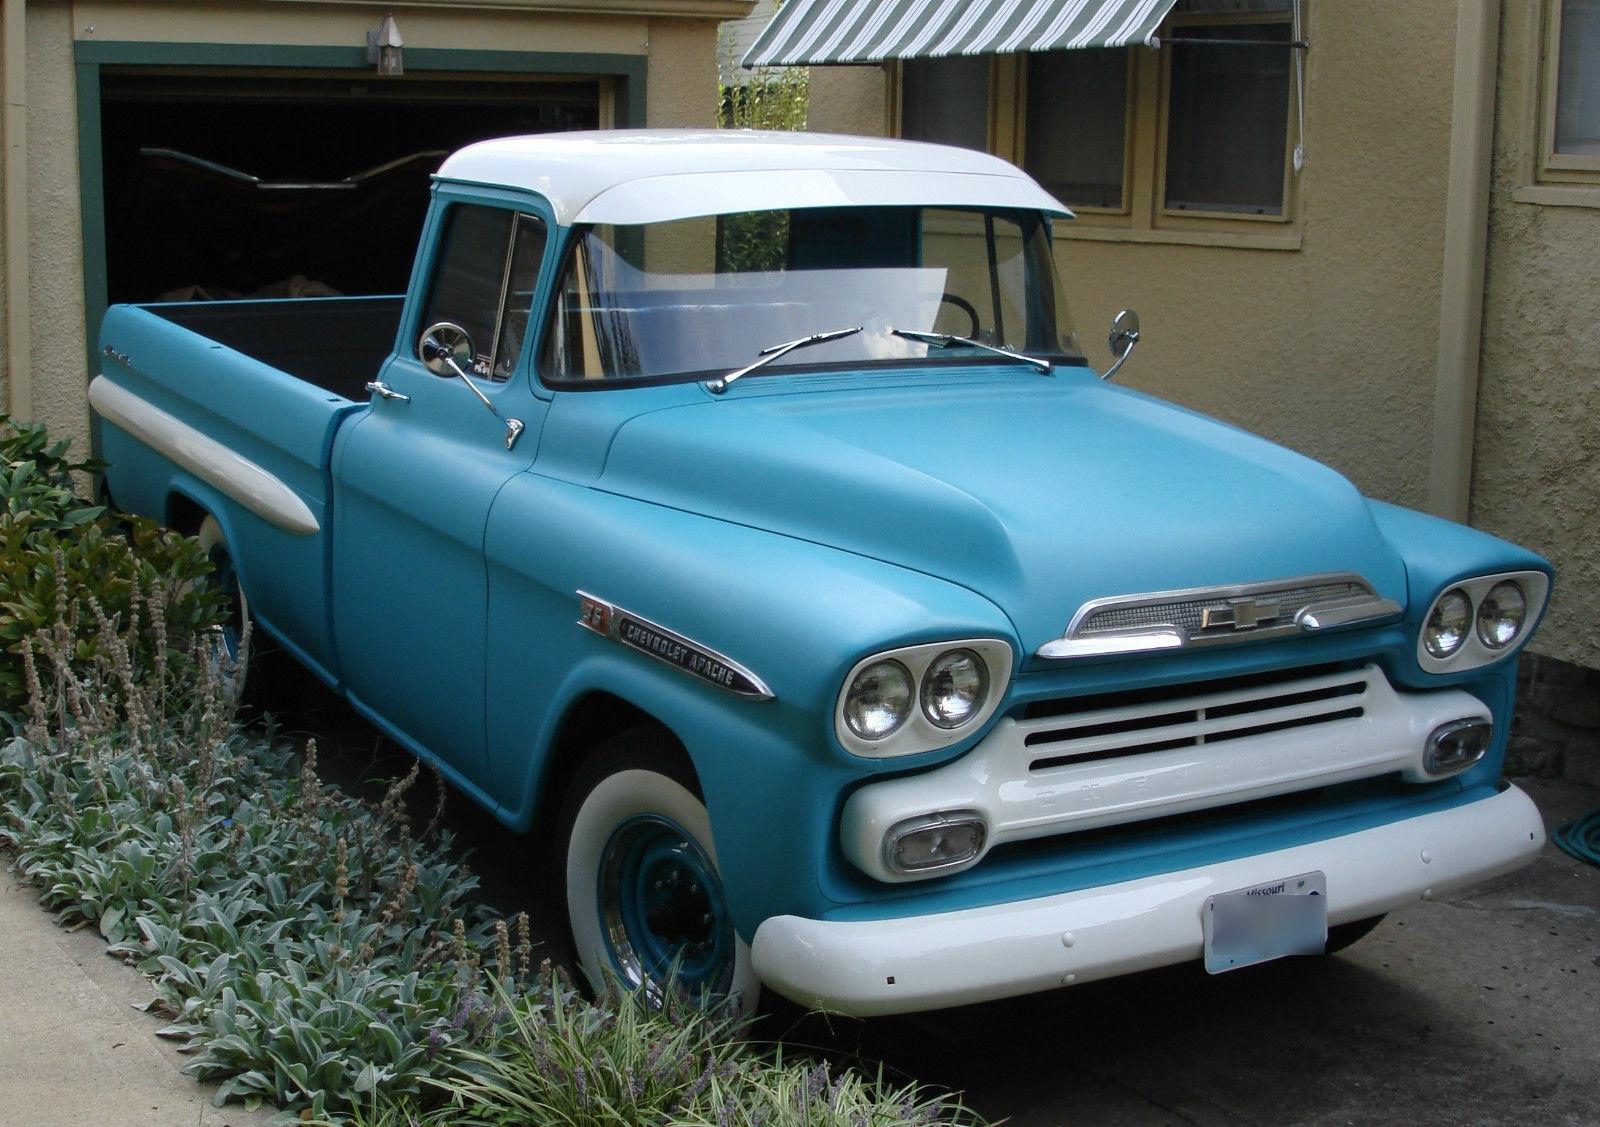 All American Classic Cars 1959 Chevrolet Apache Fleetside Pickup Truck